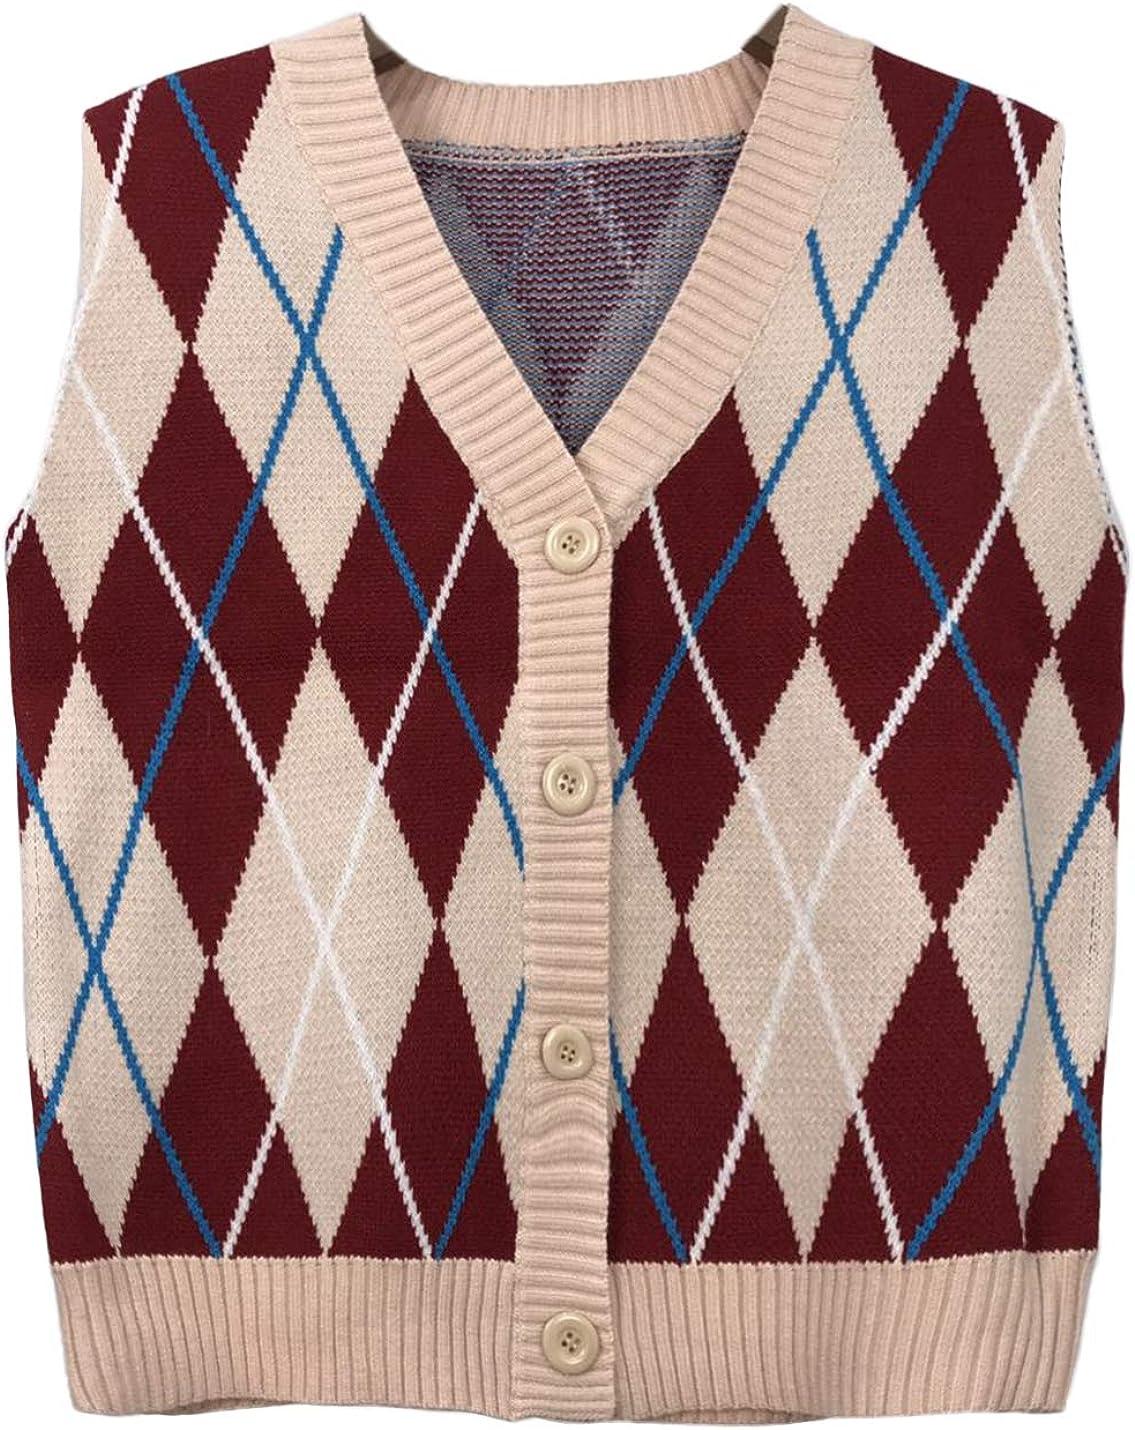 Lentta Womens Button Up V Neck Knitted Sleeveles Jacket Sweater Blockcolor Vest